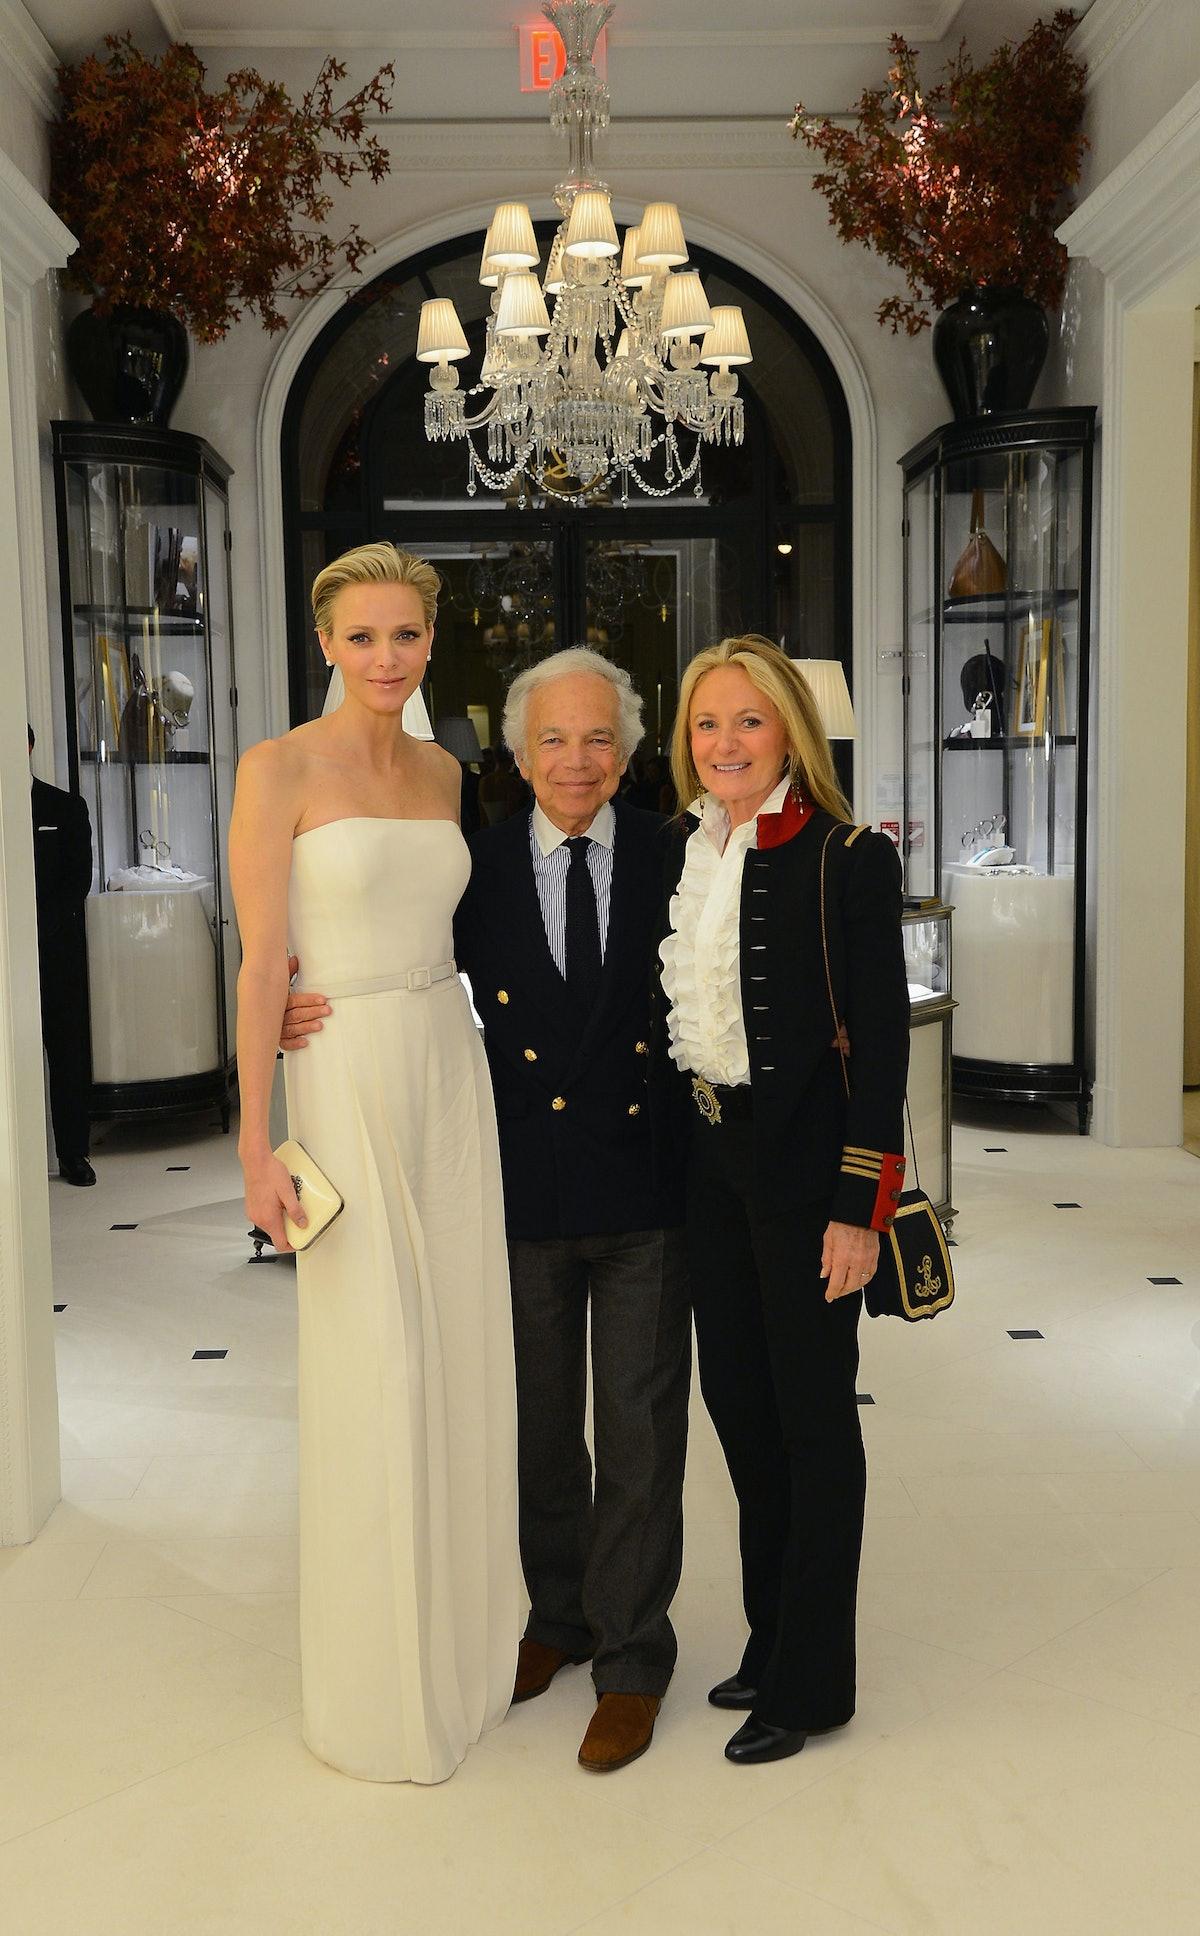 Princess Charlene of Monaco, Ralph Lauren, and Ricky Lauren